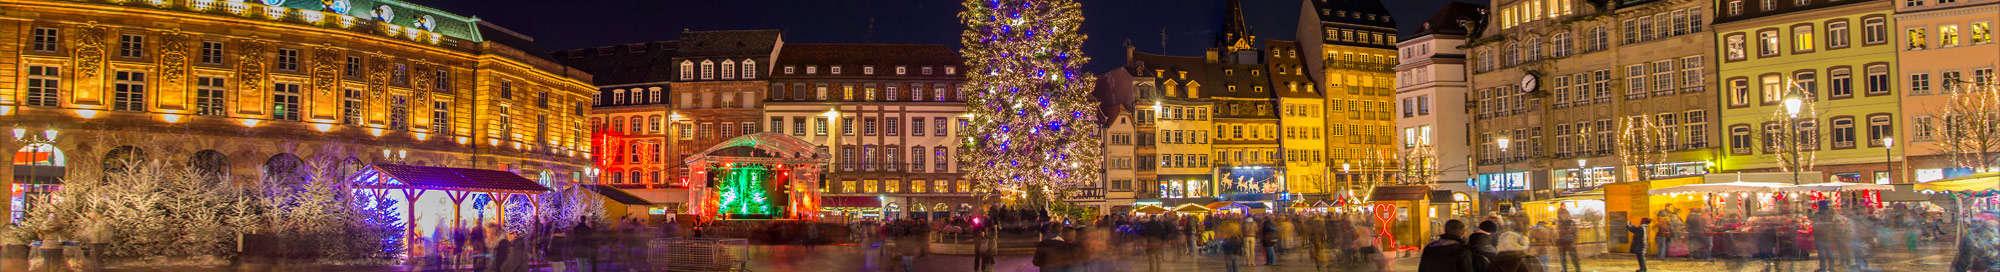 Leukste kerstmarkten weekendje weg